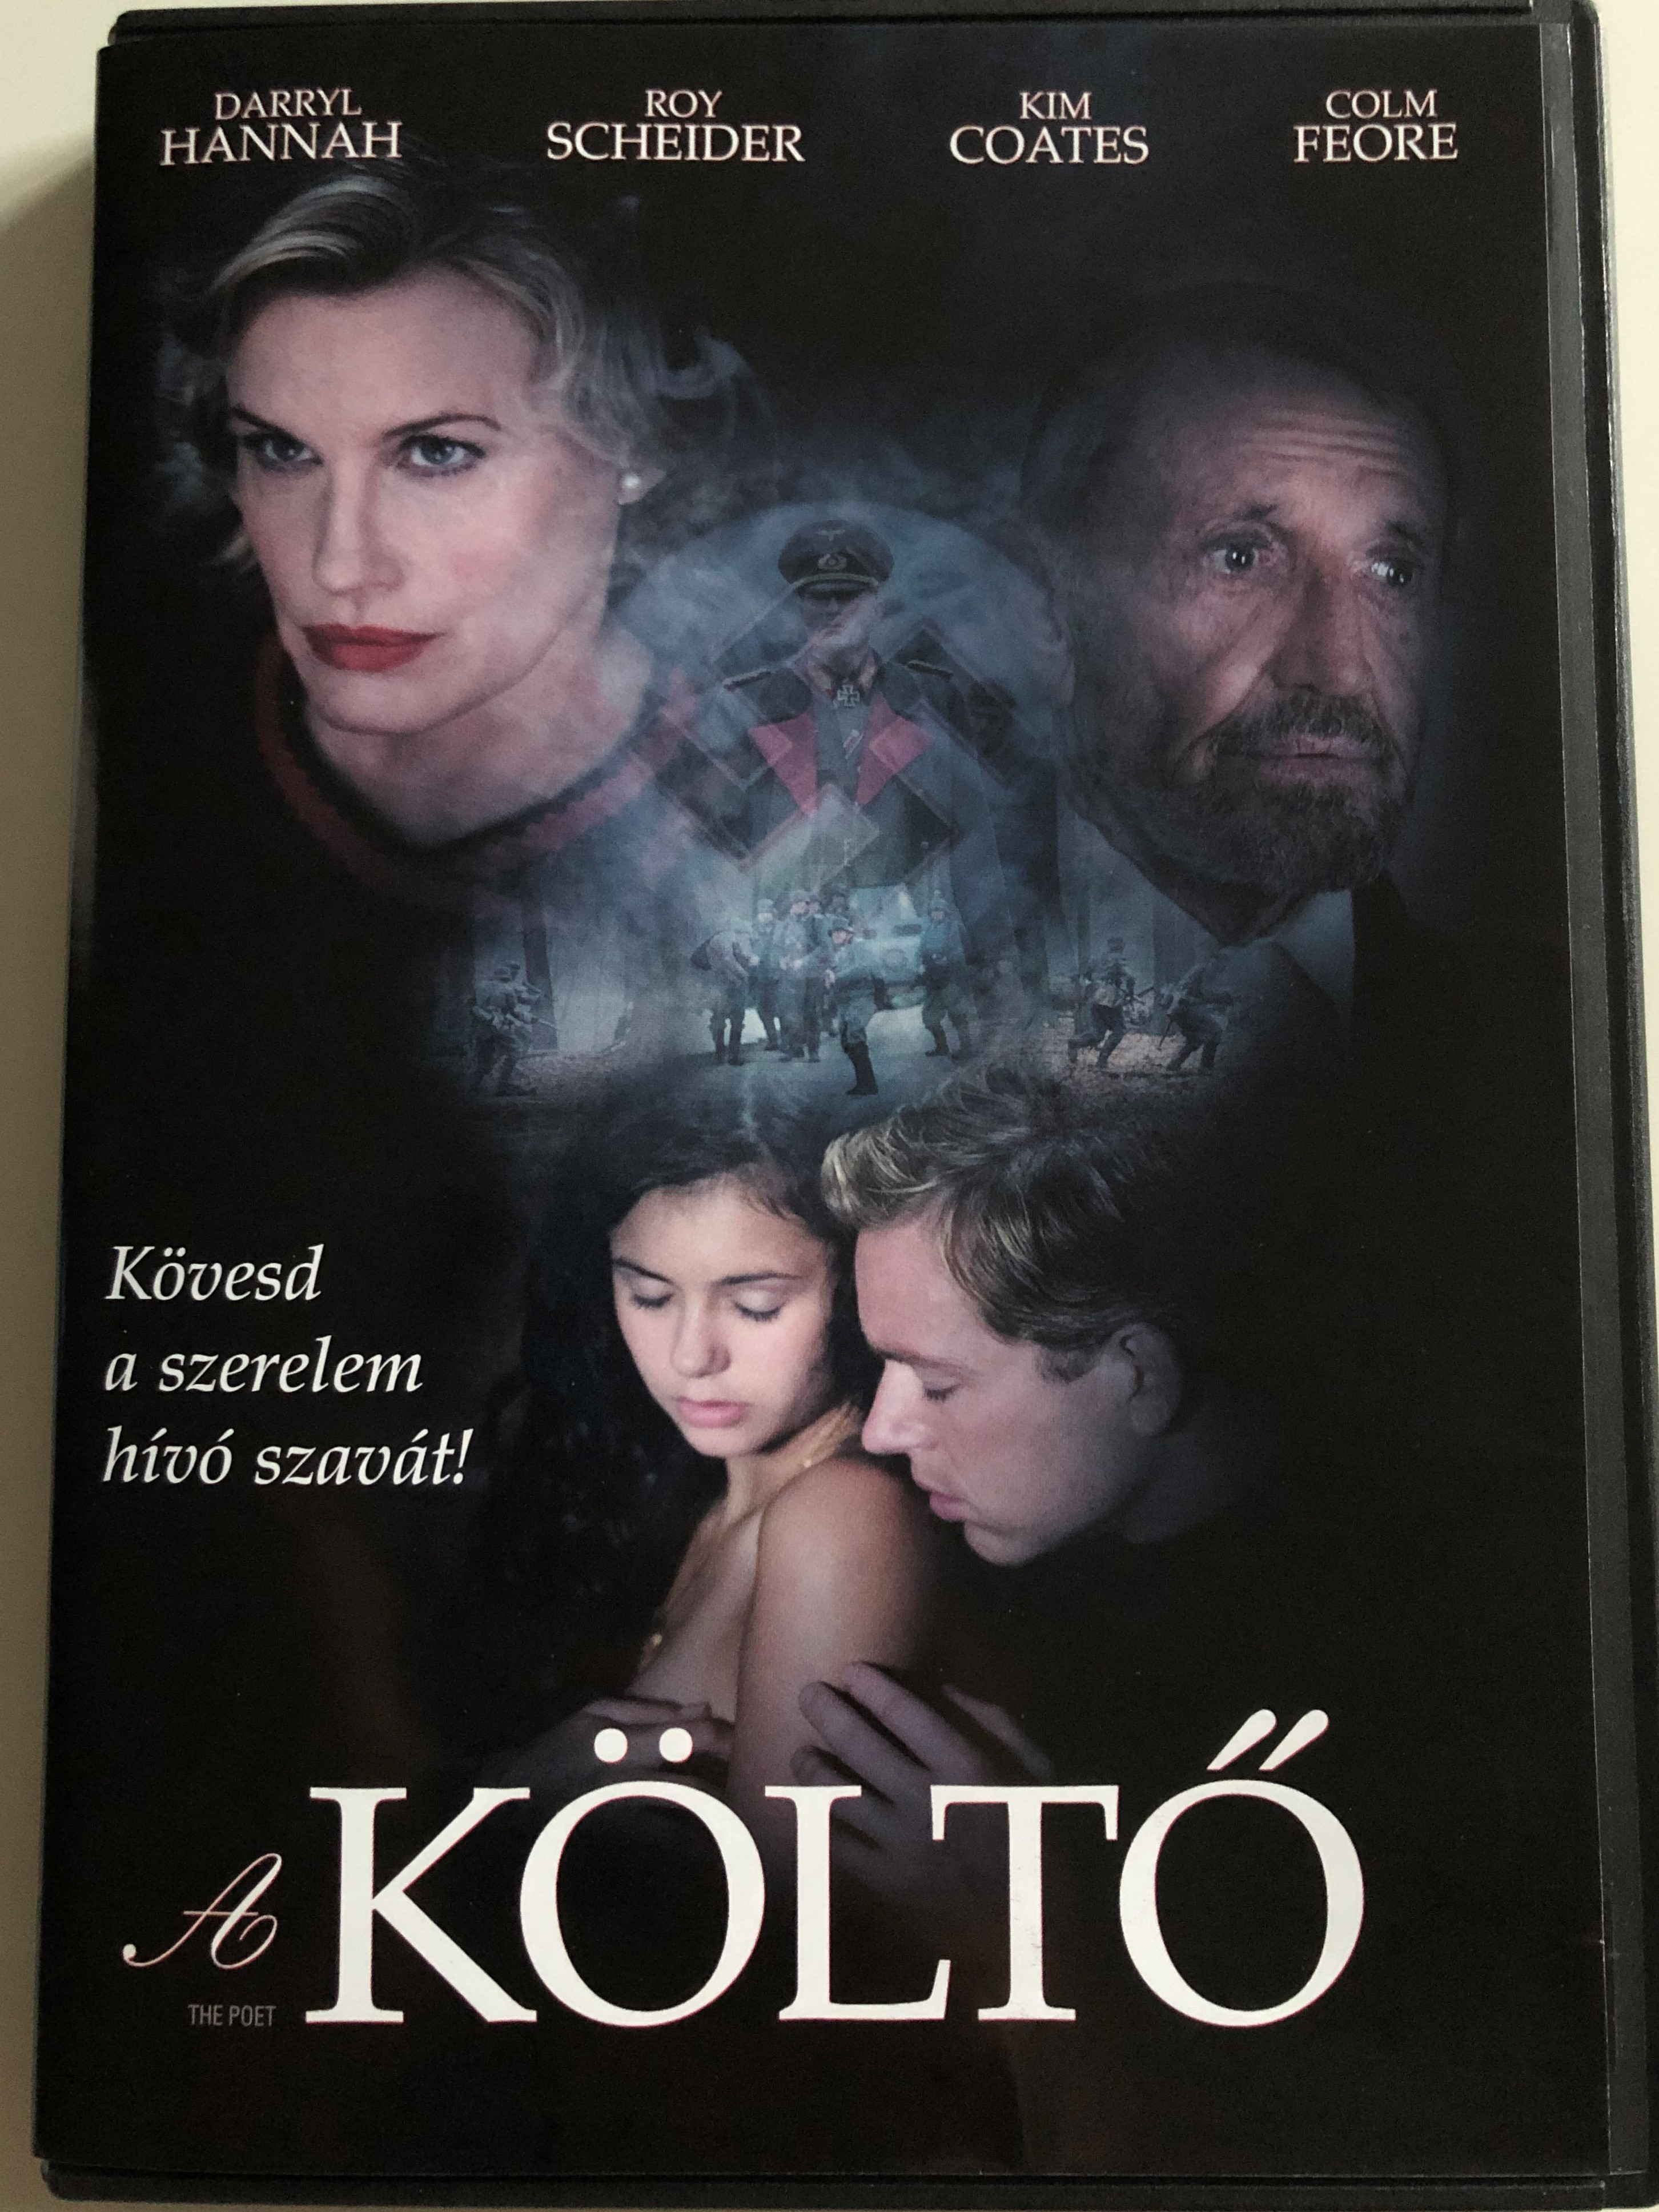 the-poet-dvd-2007-a-k-lt-directed-by-damian-lee-starring-jonathan-scarfe-nina-dobrev-zachary-bennett-daryl-hannah-kim-coates-1-.jpg